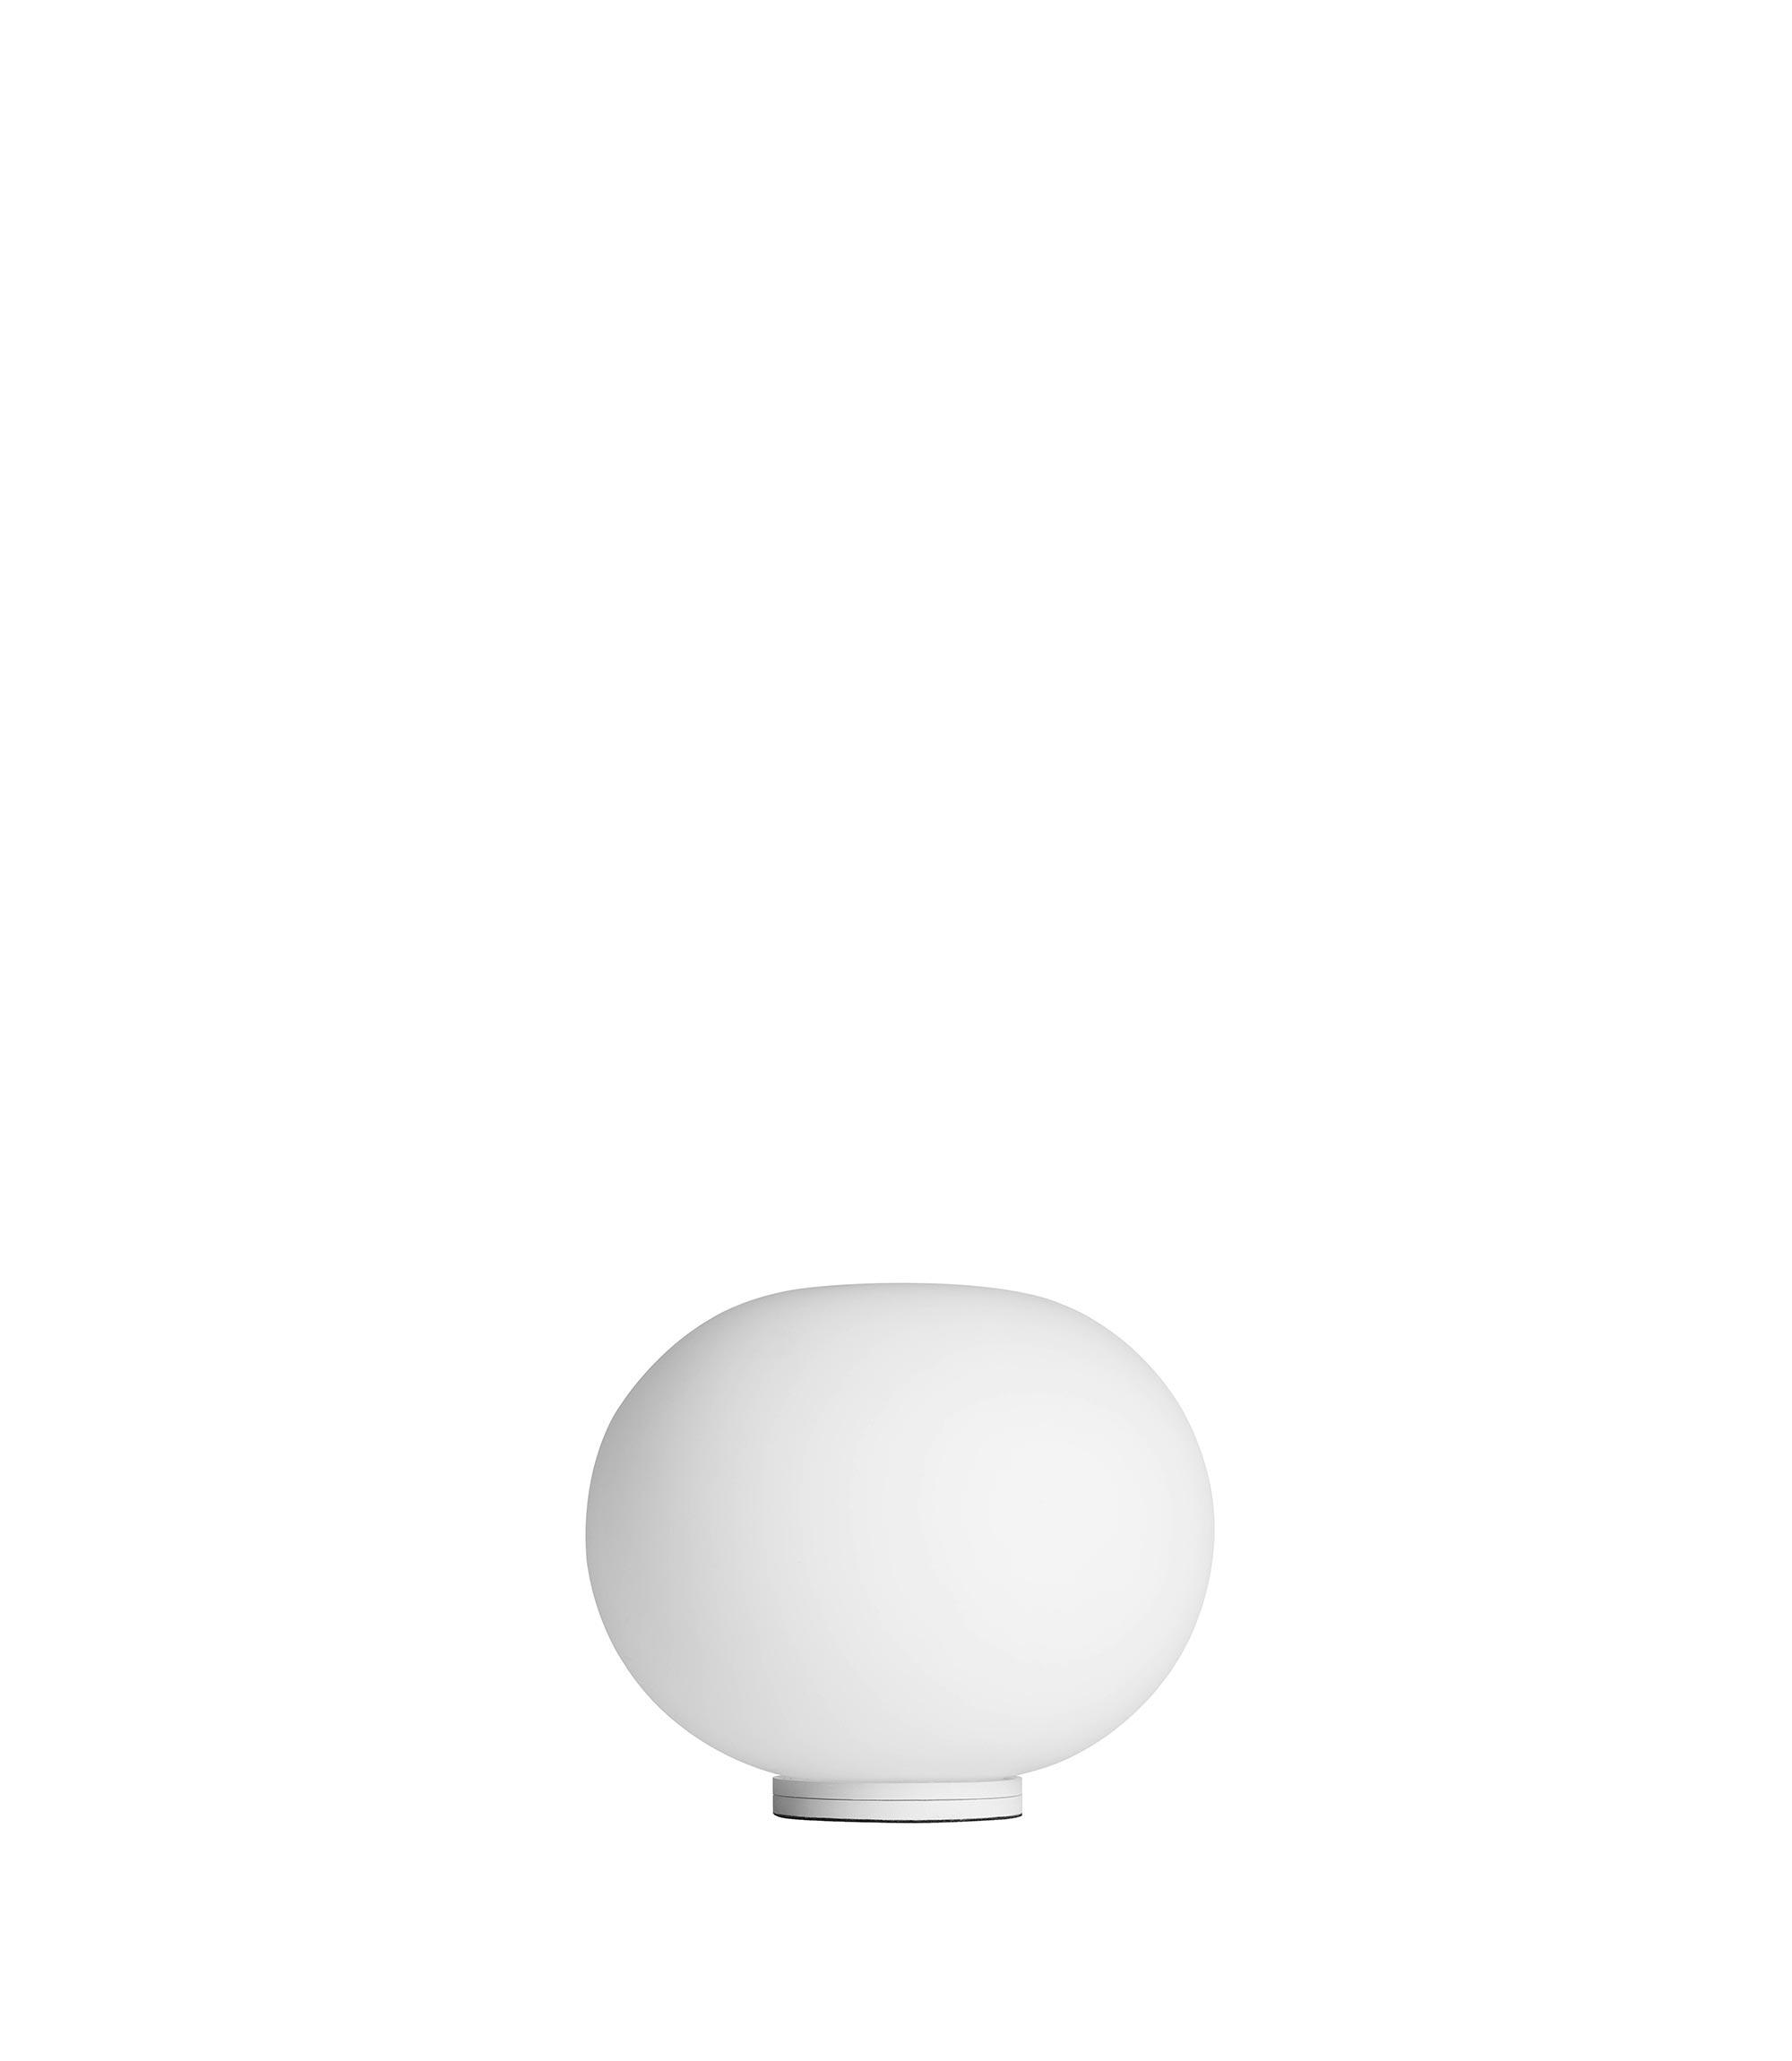 Glo ball basic table zero morrison flos F3330009 product still life big 1